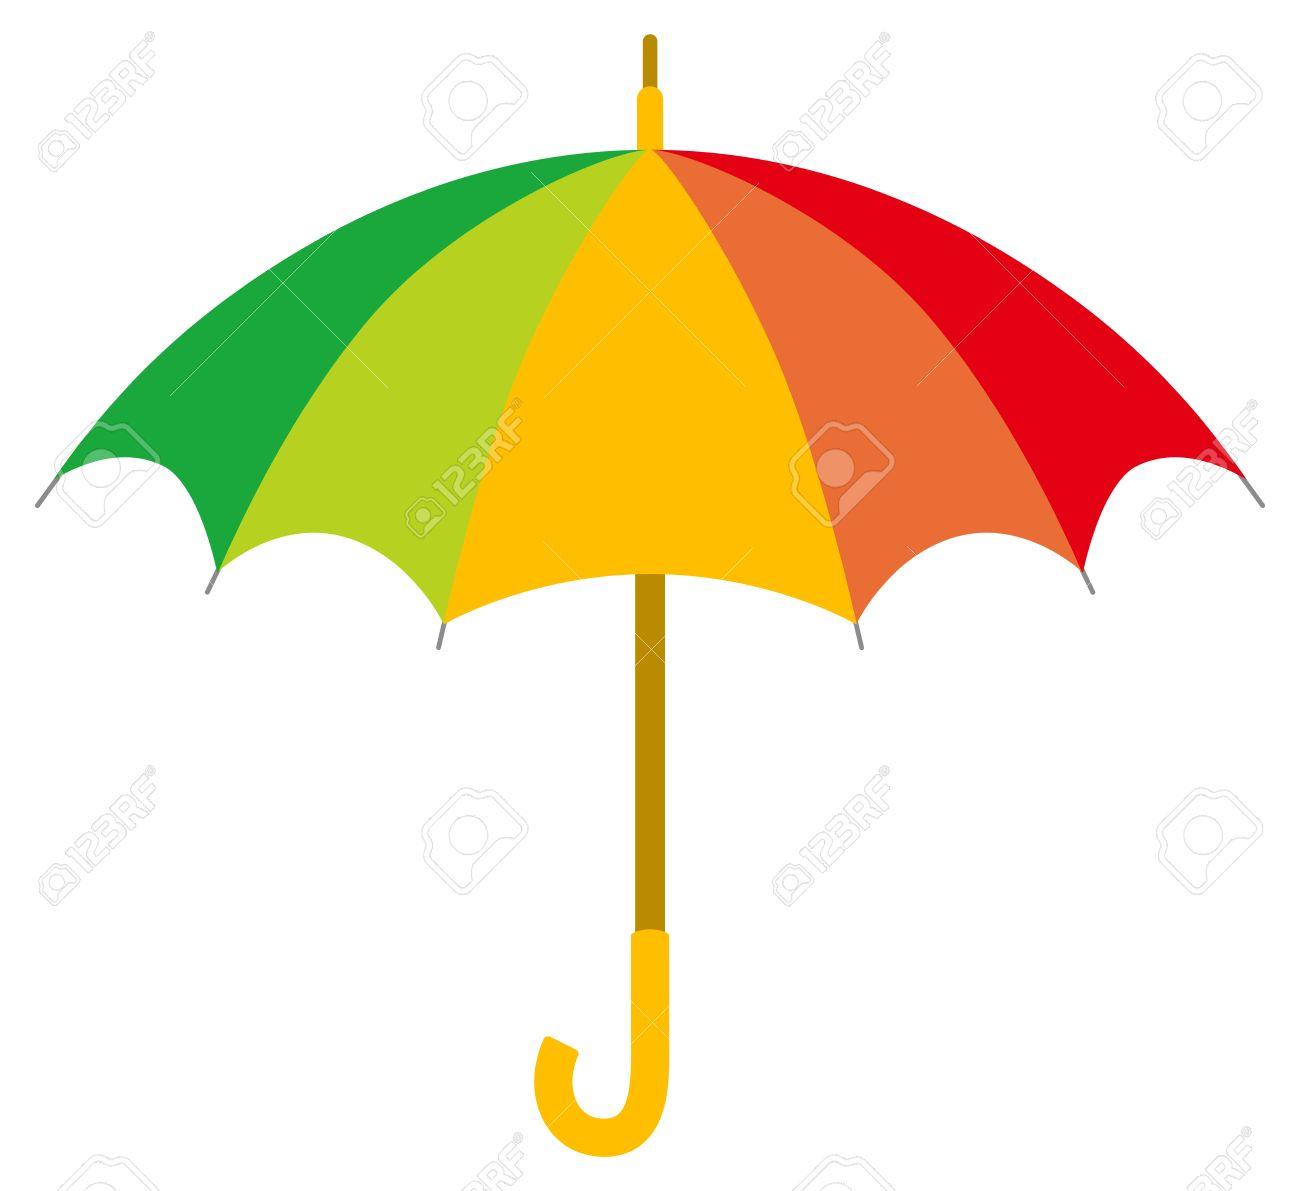 rainbow umbrella clip art - photo #43